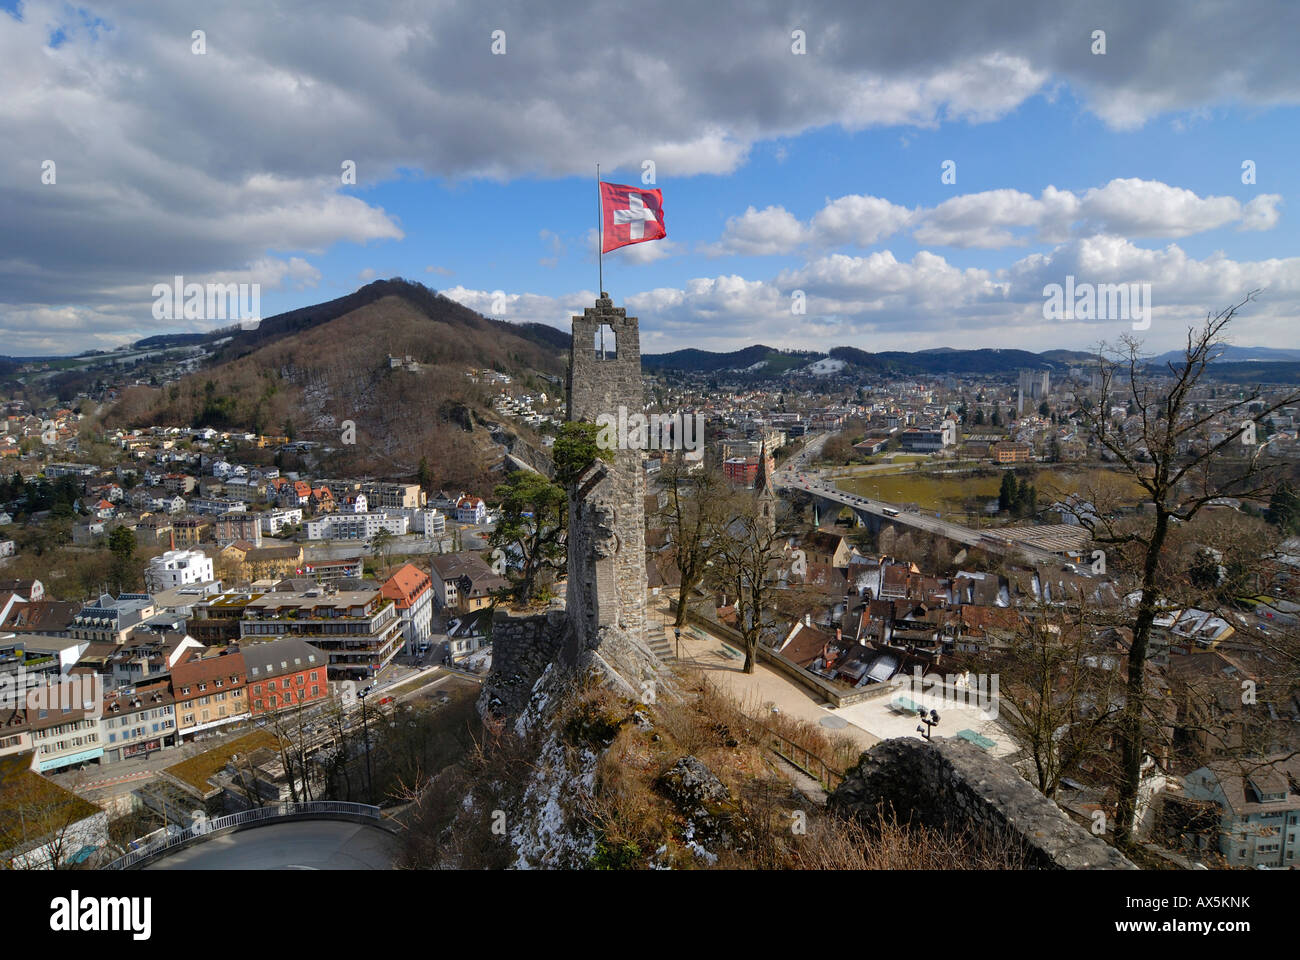 Stein fortress ruins, Baden, Aargau Canton, Switzerland, Europe - Stock Image